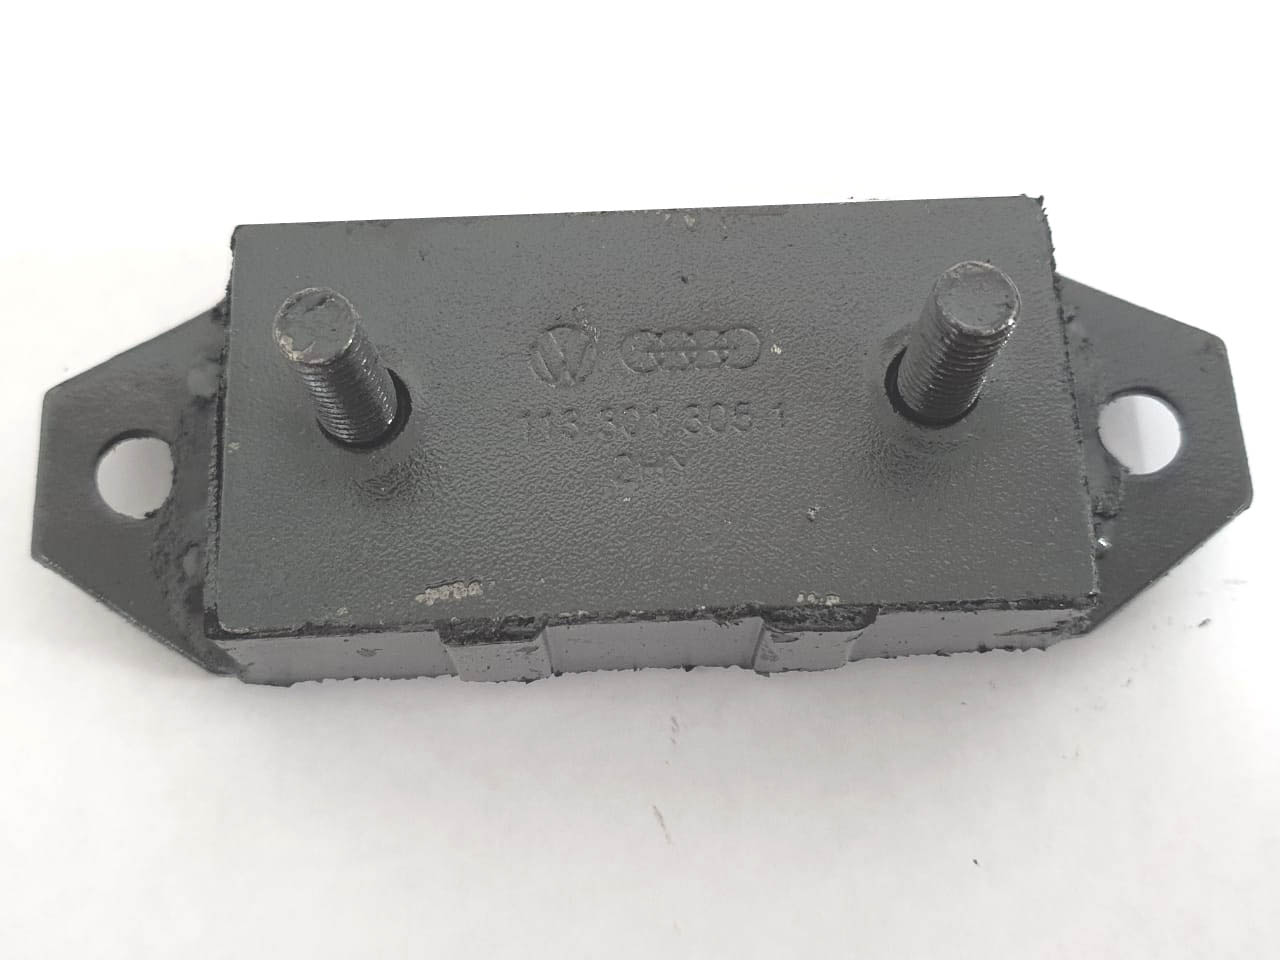 Coxim motor original FUSCA 1300/1500/1600 SEDAN   - SSR Peças & Acessórios ltda ME.